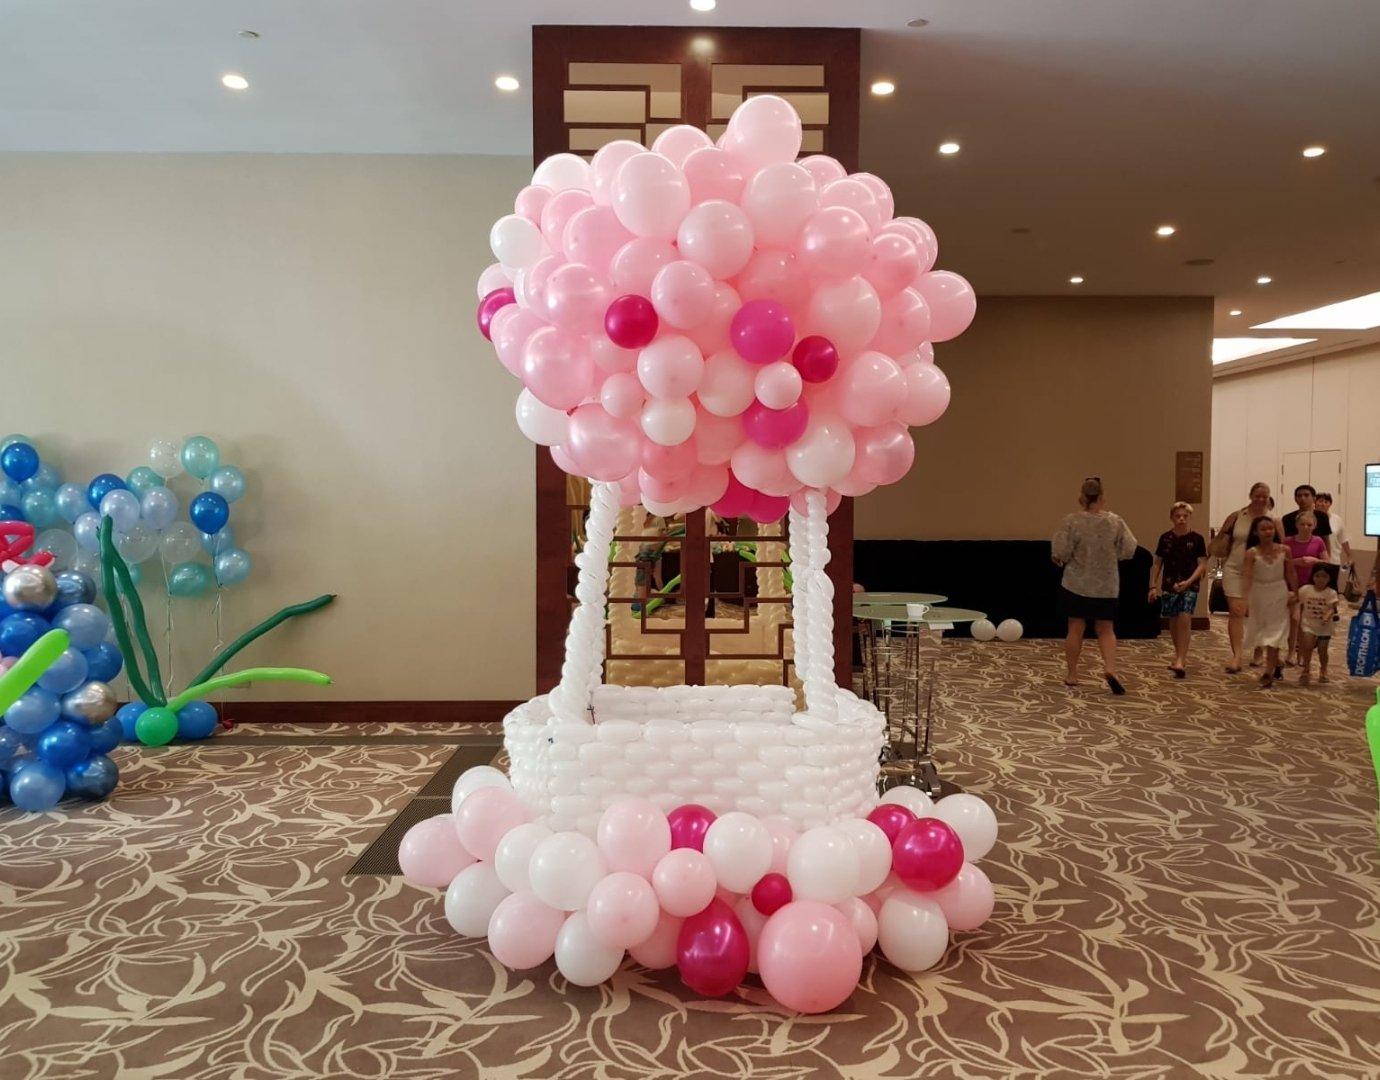 , Organic Hot Air Balloon Display, Singapore Balloon Decoration Services - Balloon Workshop and Balloon Sculpting